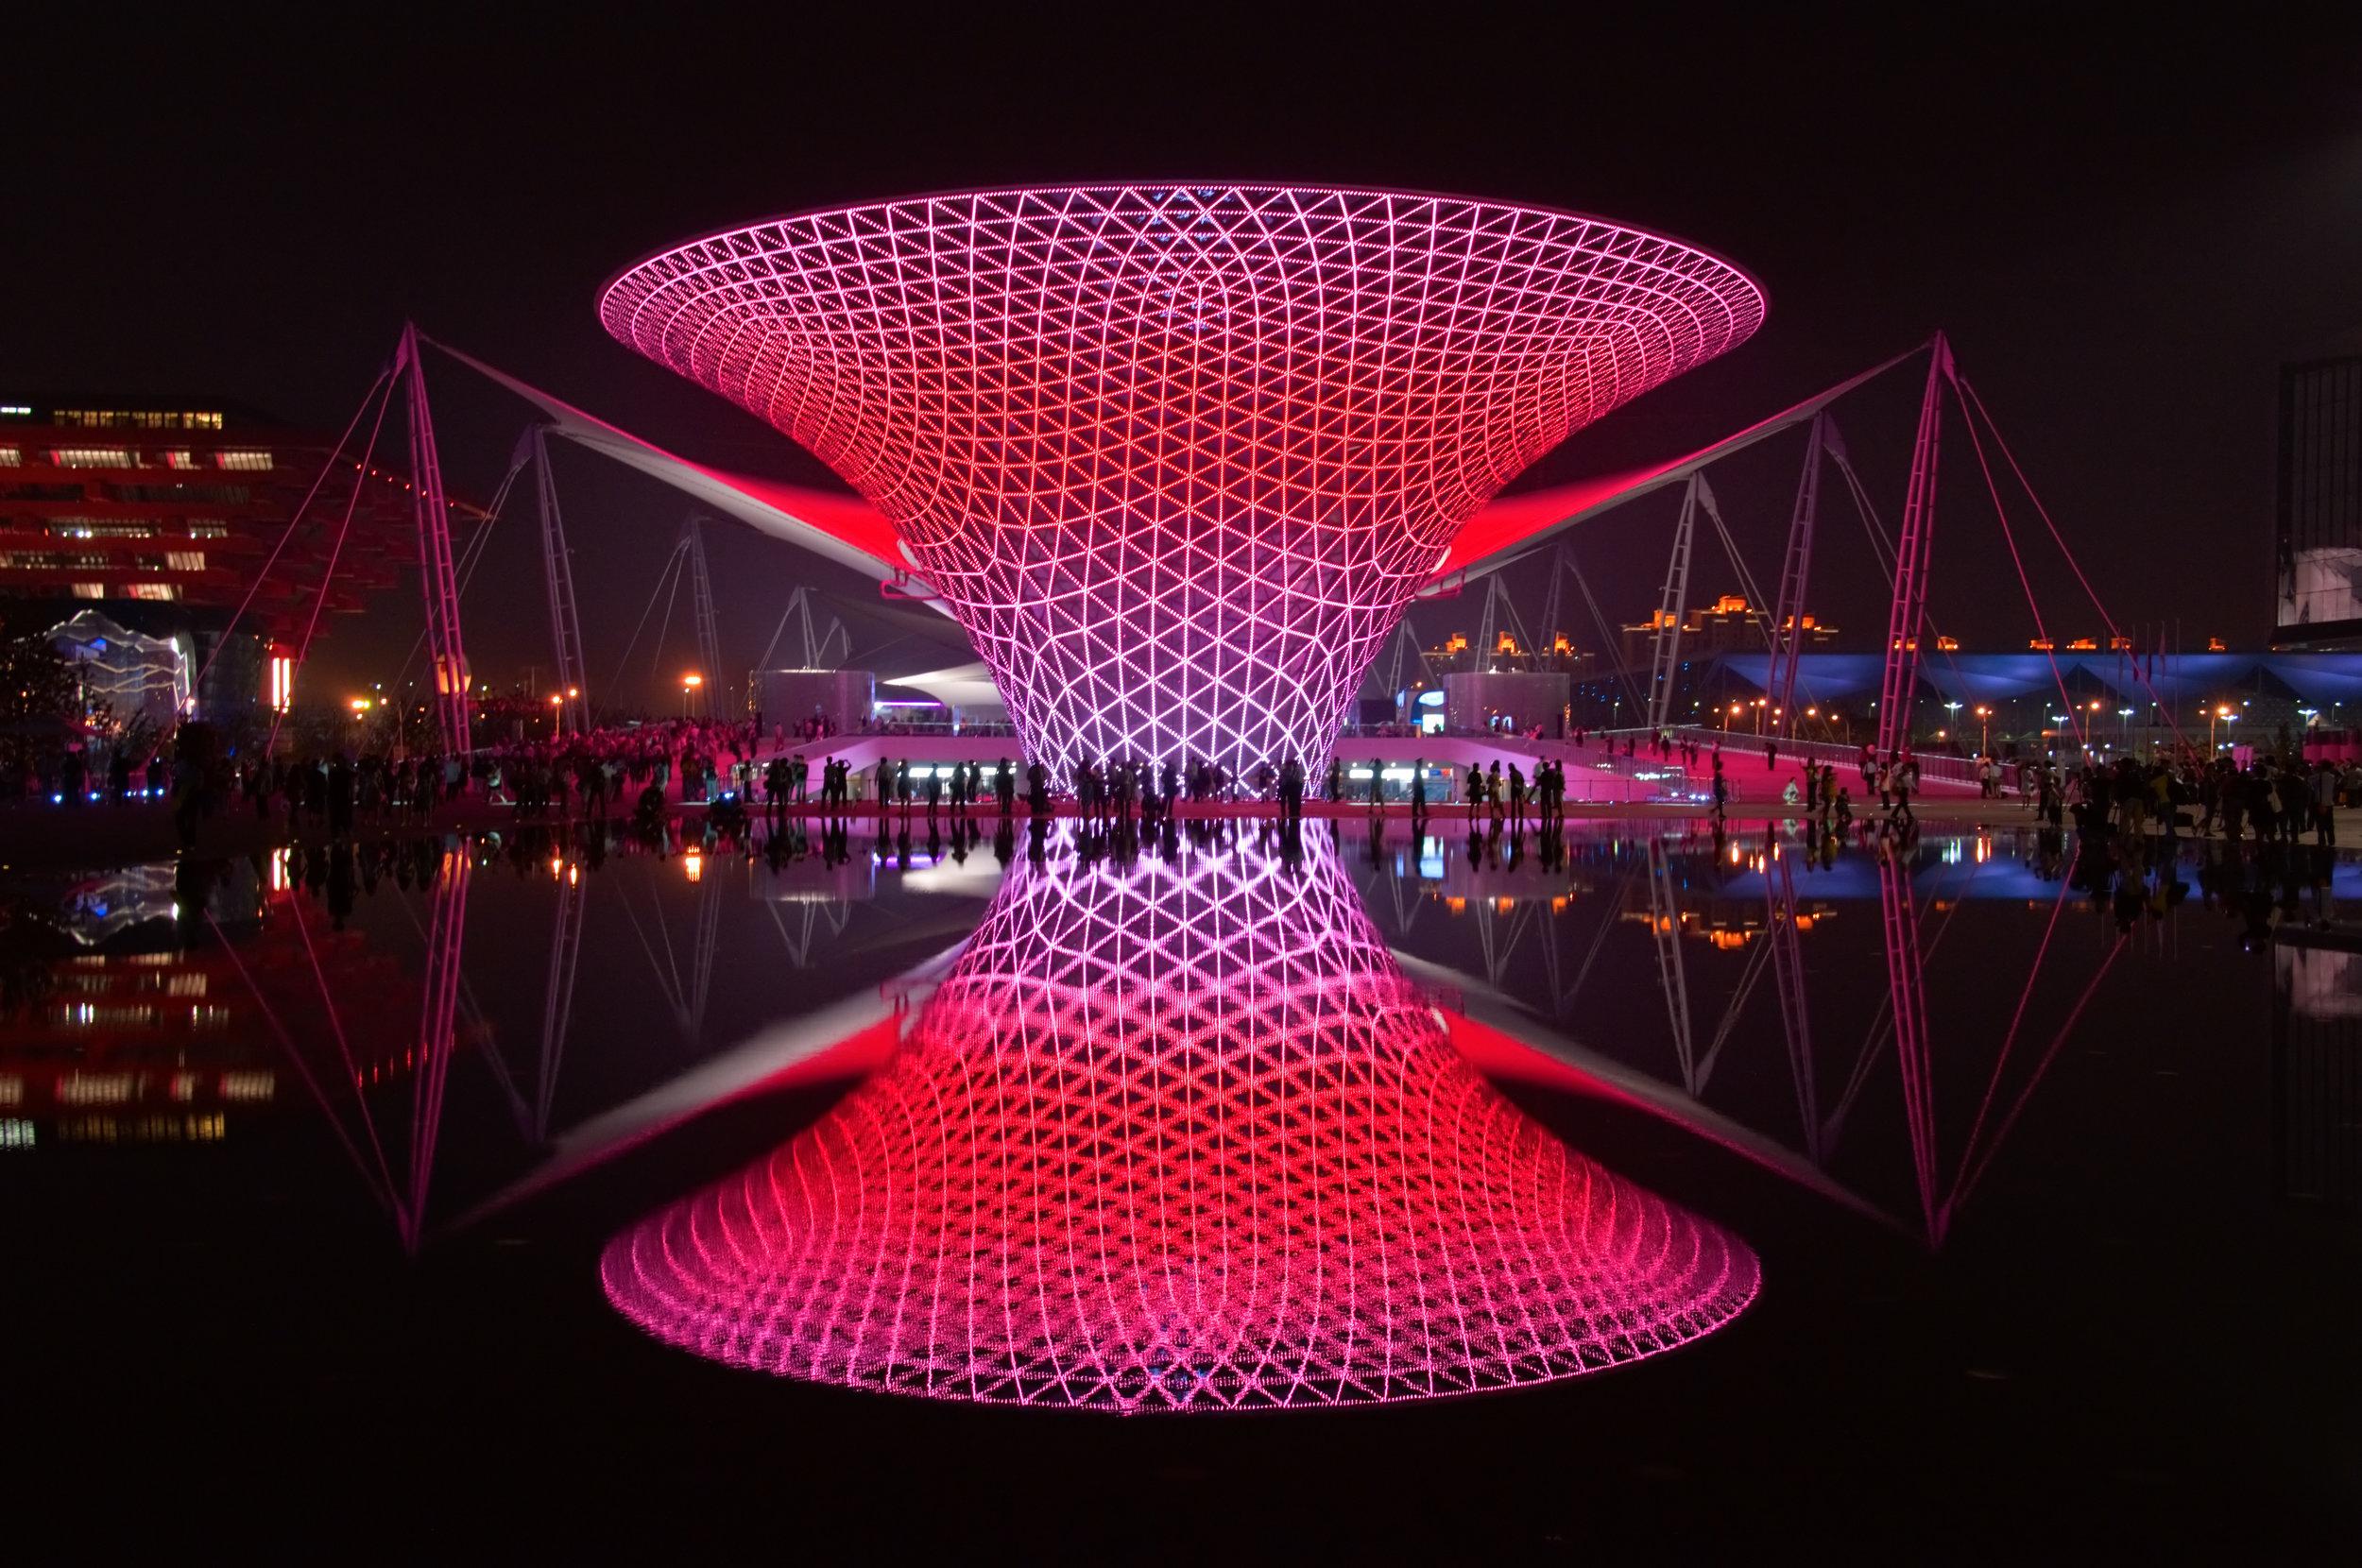 Photo: EXPO 2015, Milan, Italy